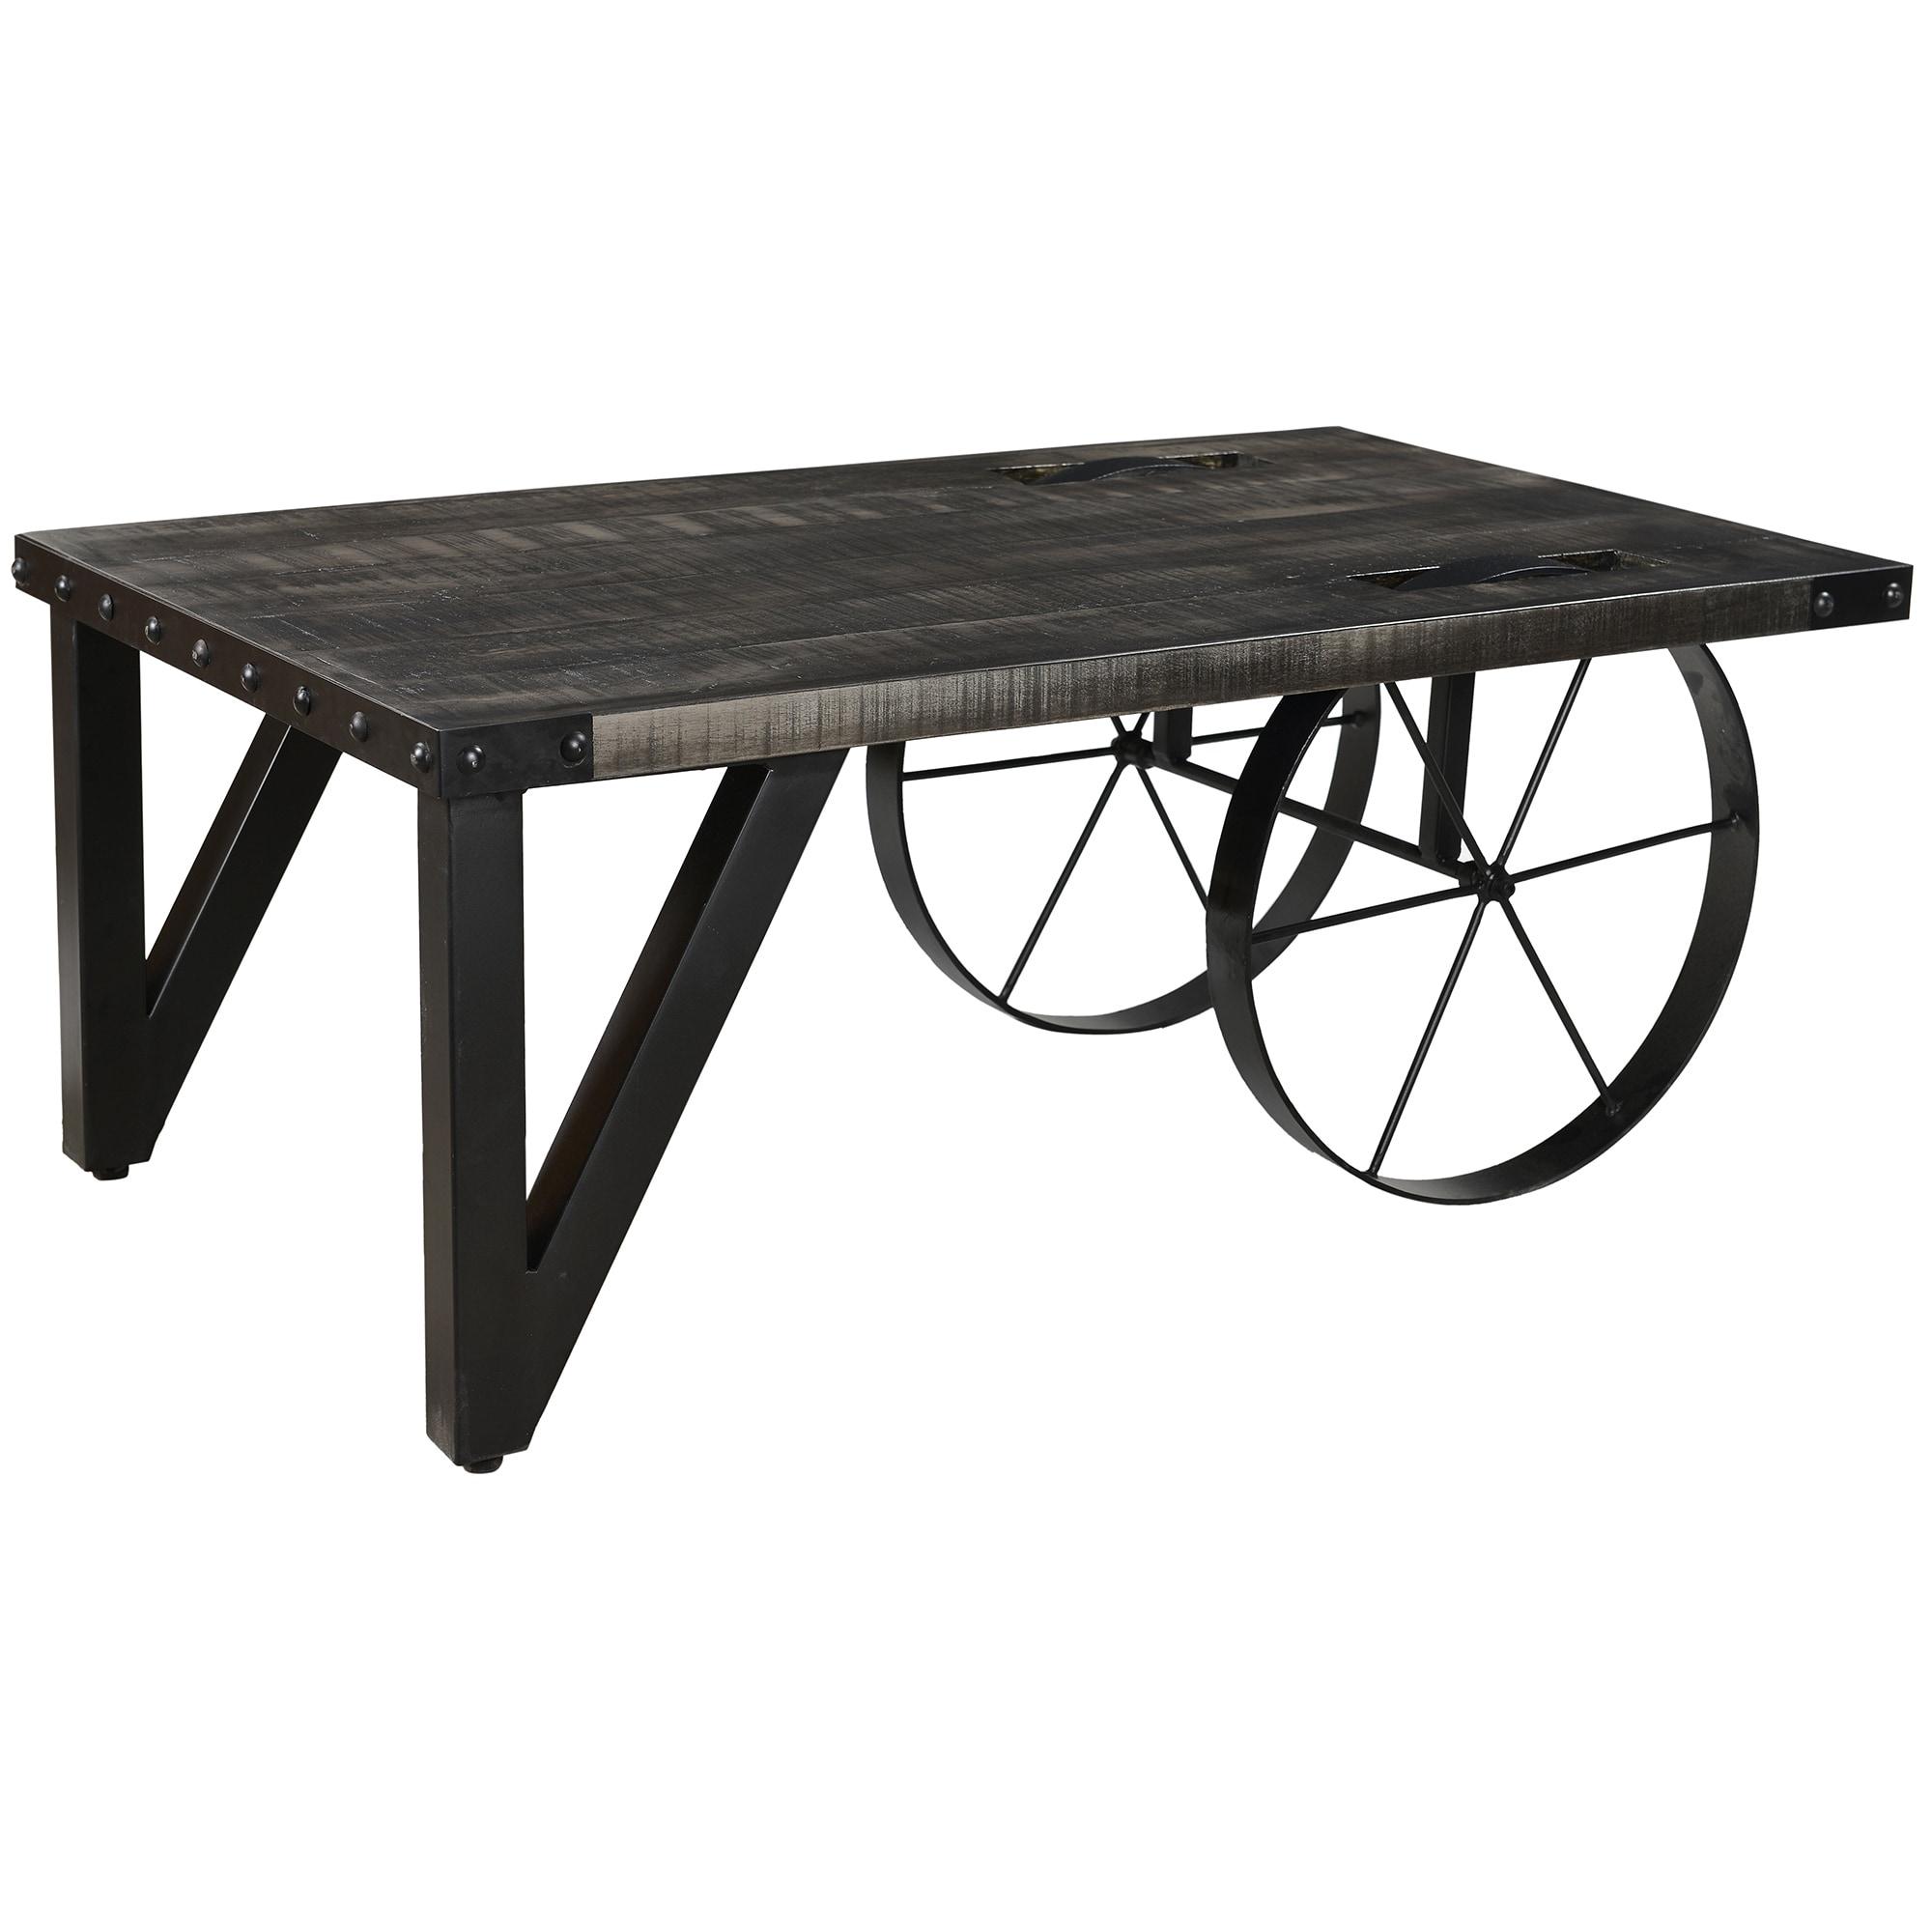 Zahir Distressed Grey Mango Wood Cast Iron Coffee Table